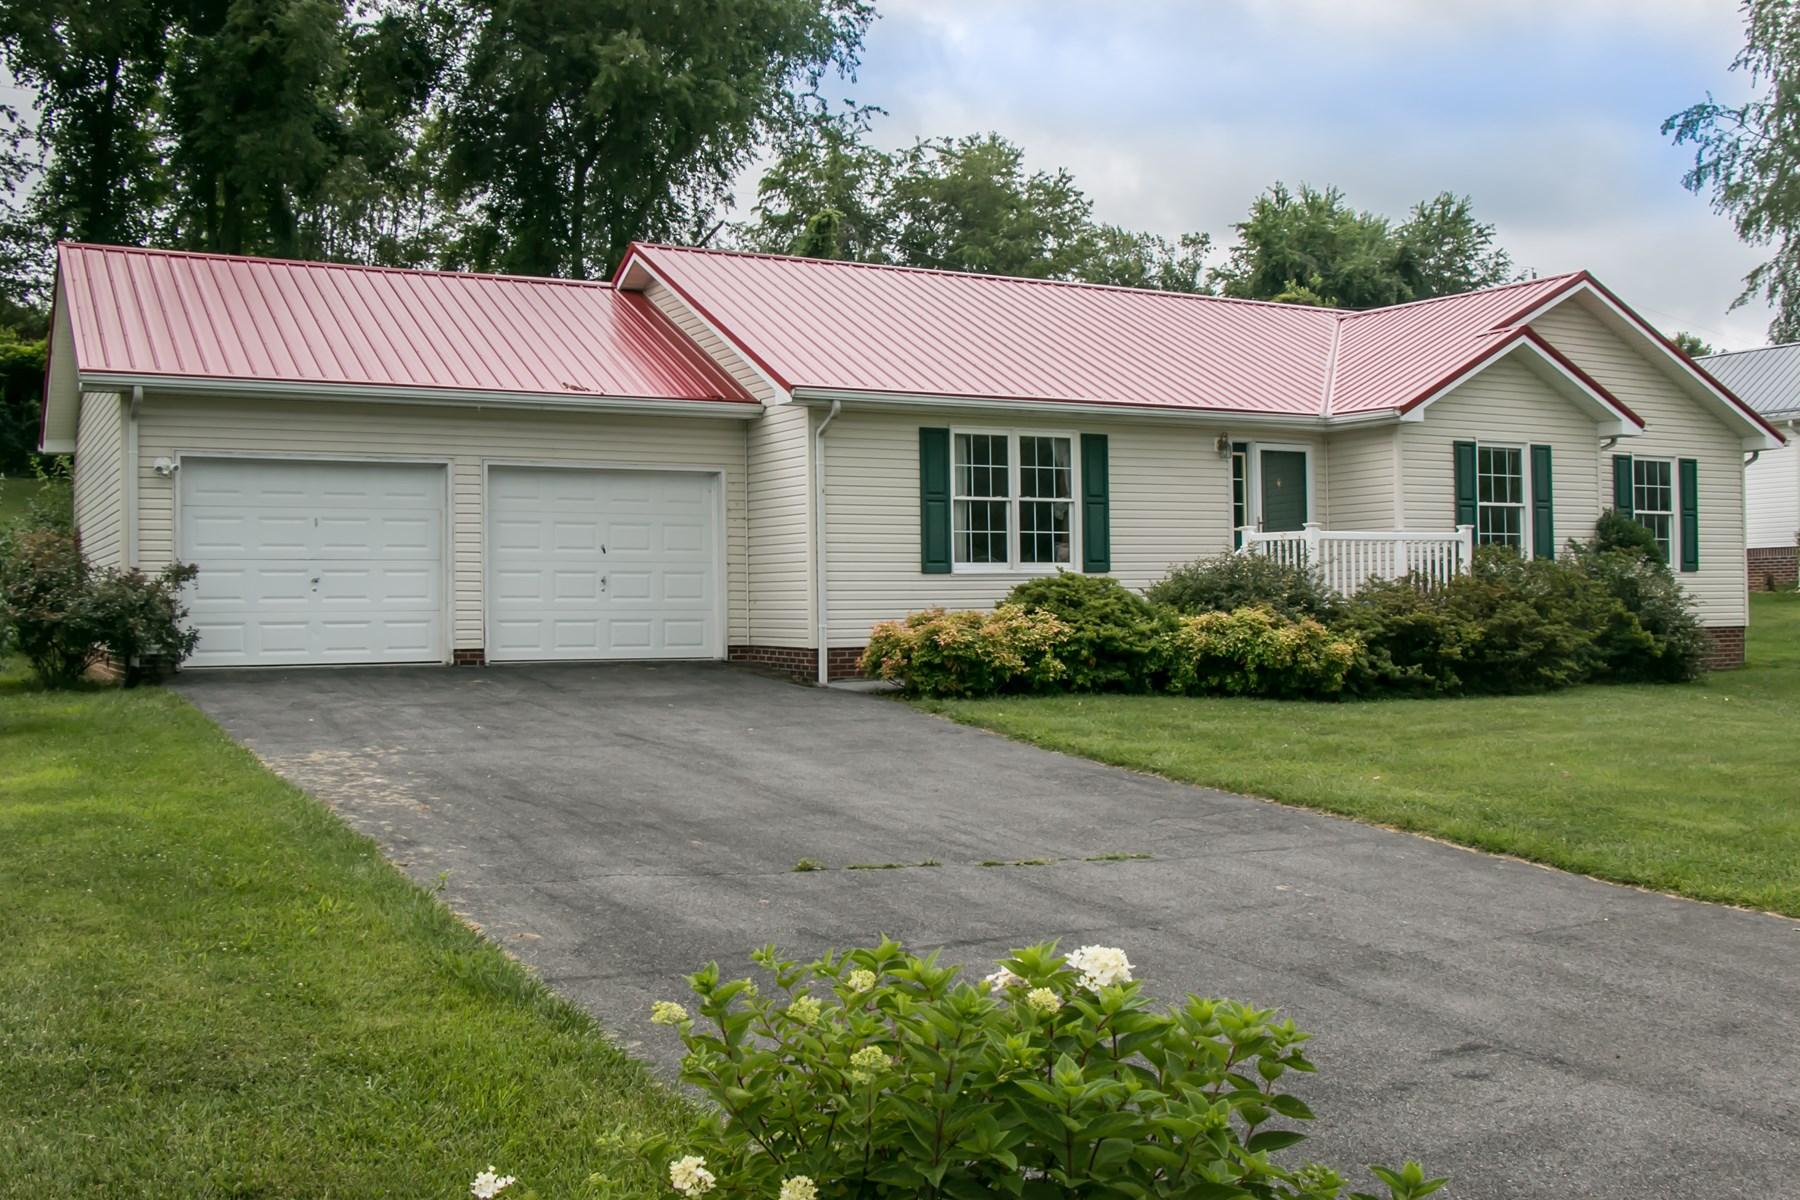 One Level Home for Sale in Abingdon VA